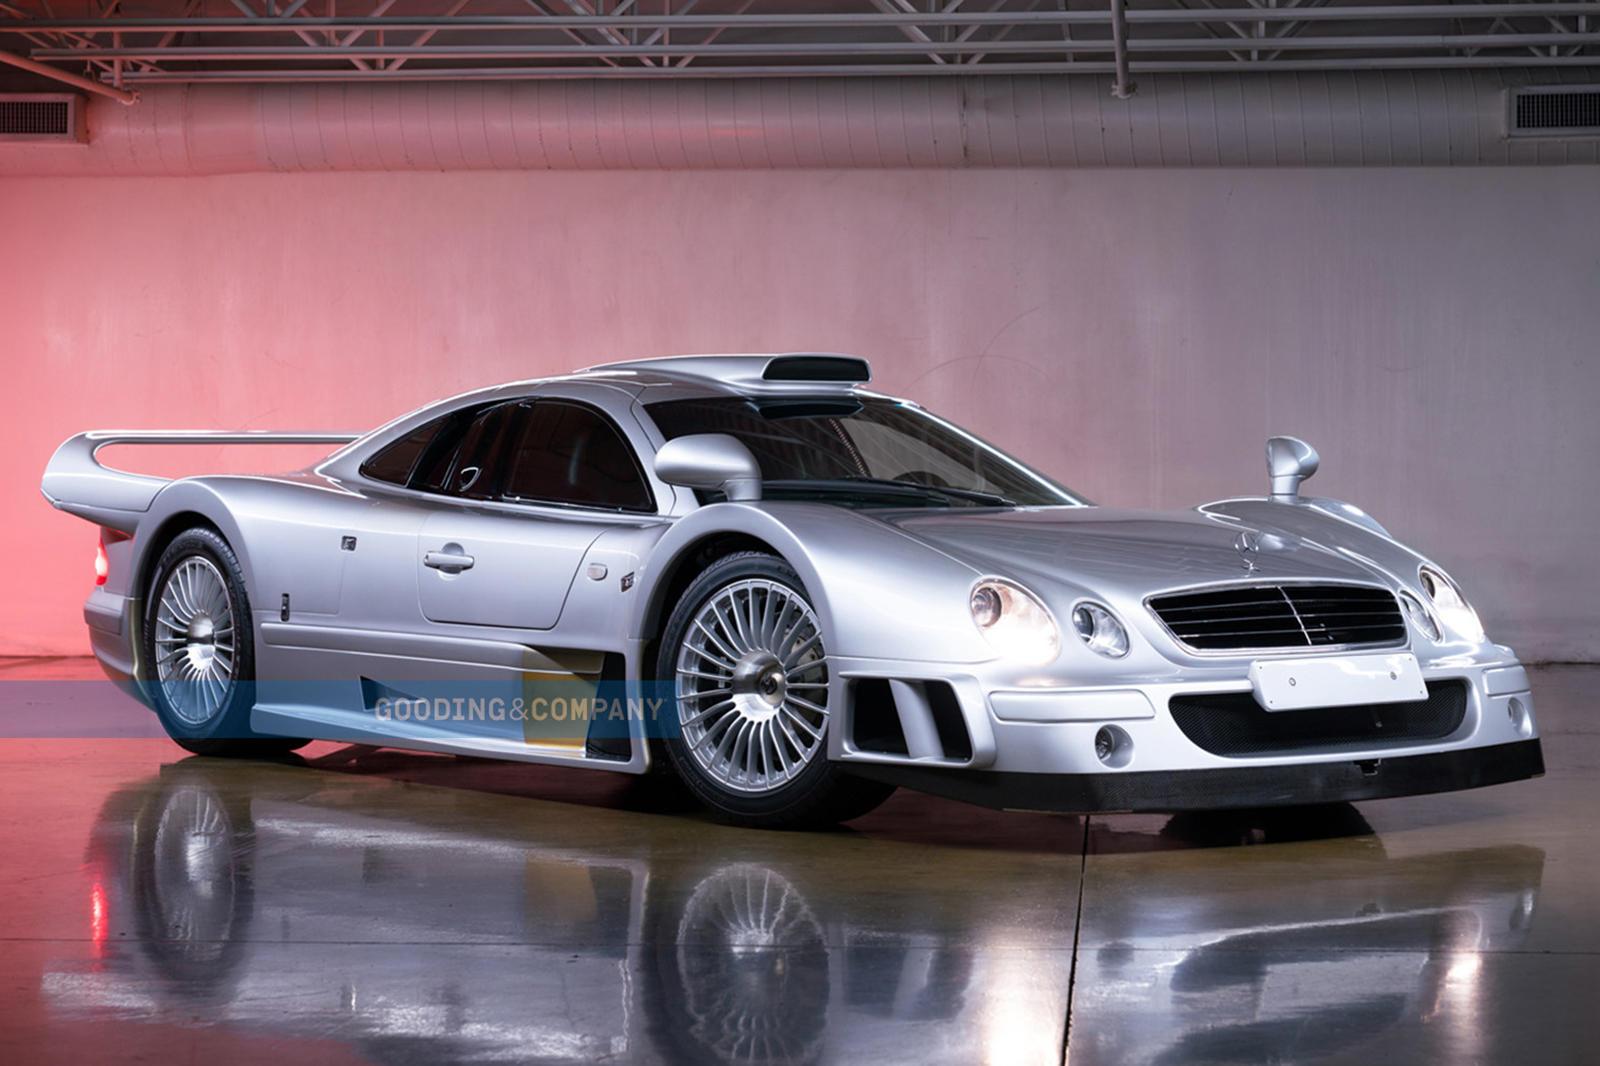 95912 Super Rare Road-Legal Mercedes-Benz AMG CLK GTR Is A $10 Million Bargain